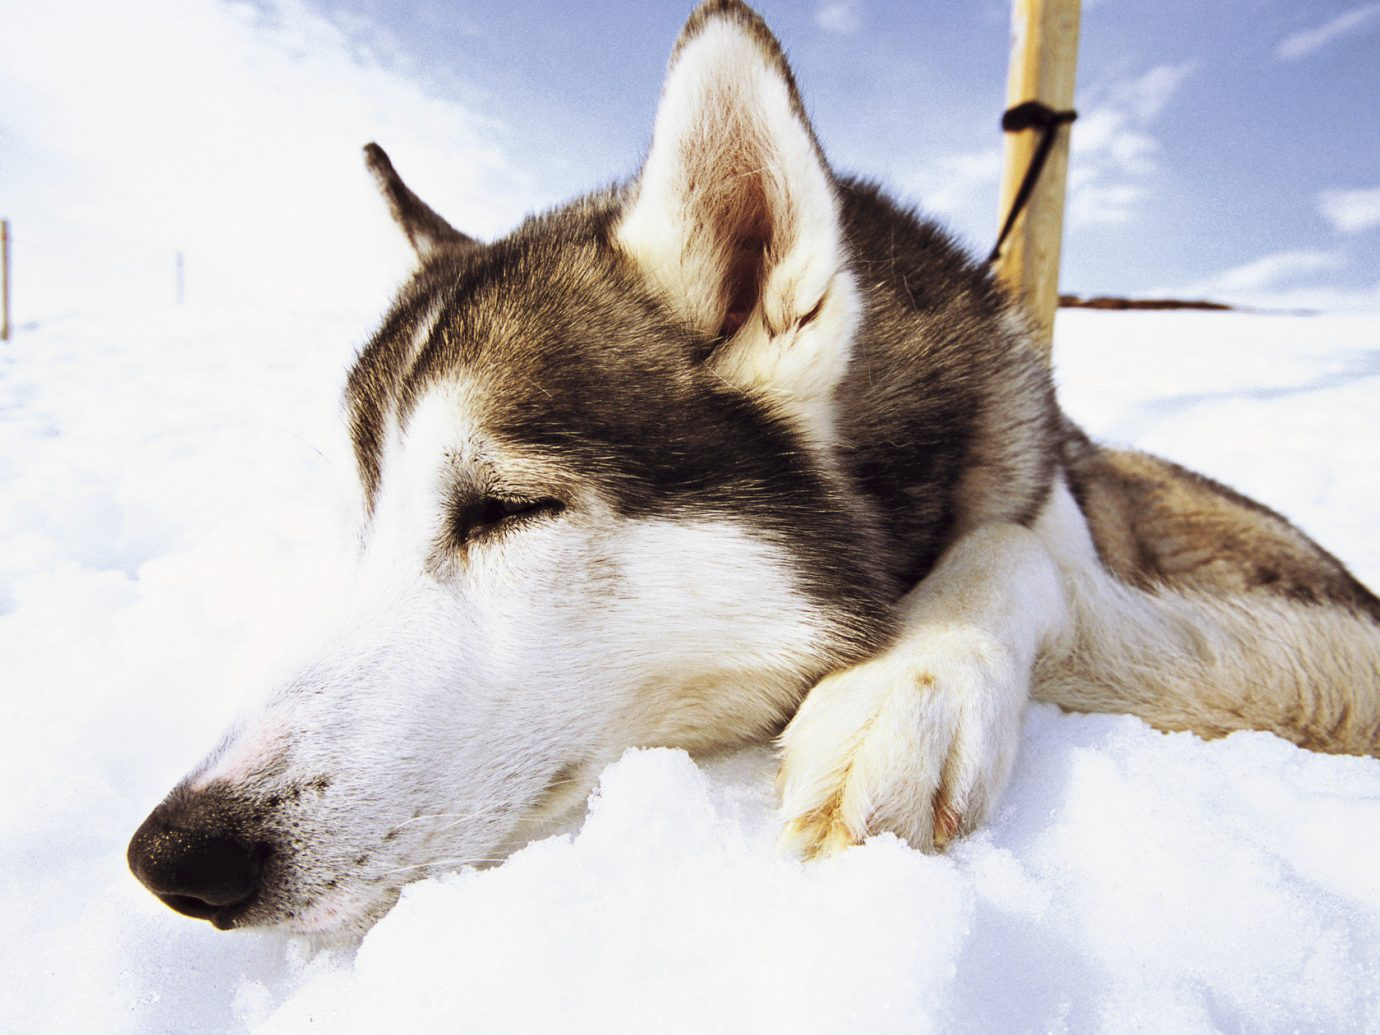 Adventure Trip Ideas Dog snow outdoor siberian husky mammal dog breed vertebrate sled dog laying Winter dog breed group greenland dog dog like mammal east siberian laika northern inuit dog alaskan malamute saarloos wolfdog west siberian laika wolfdog